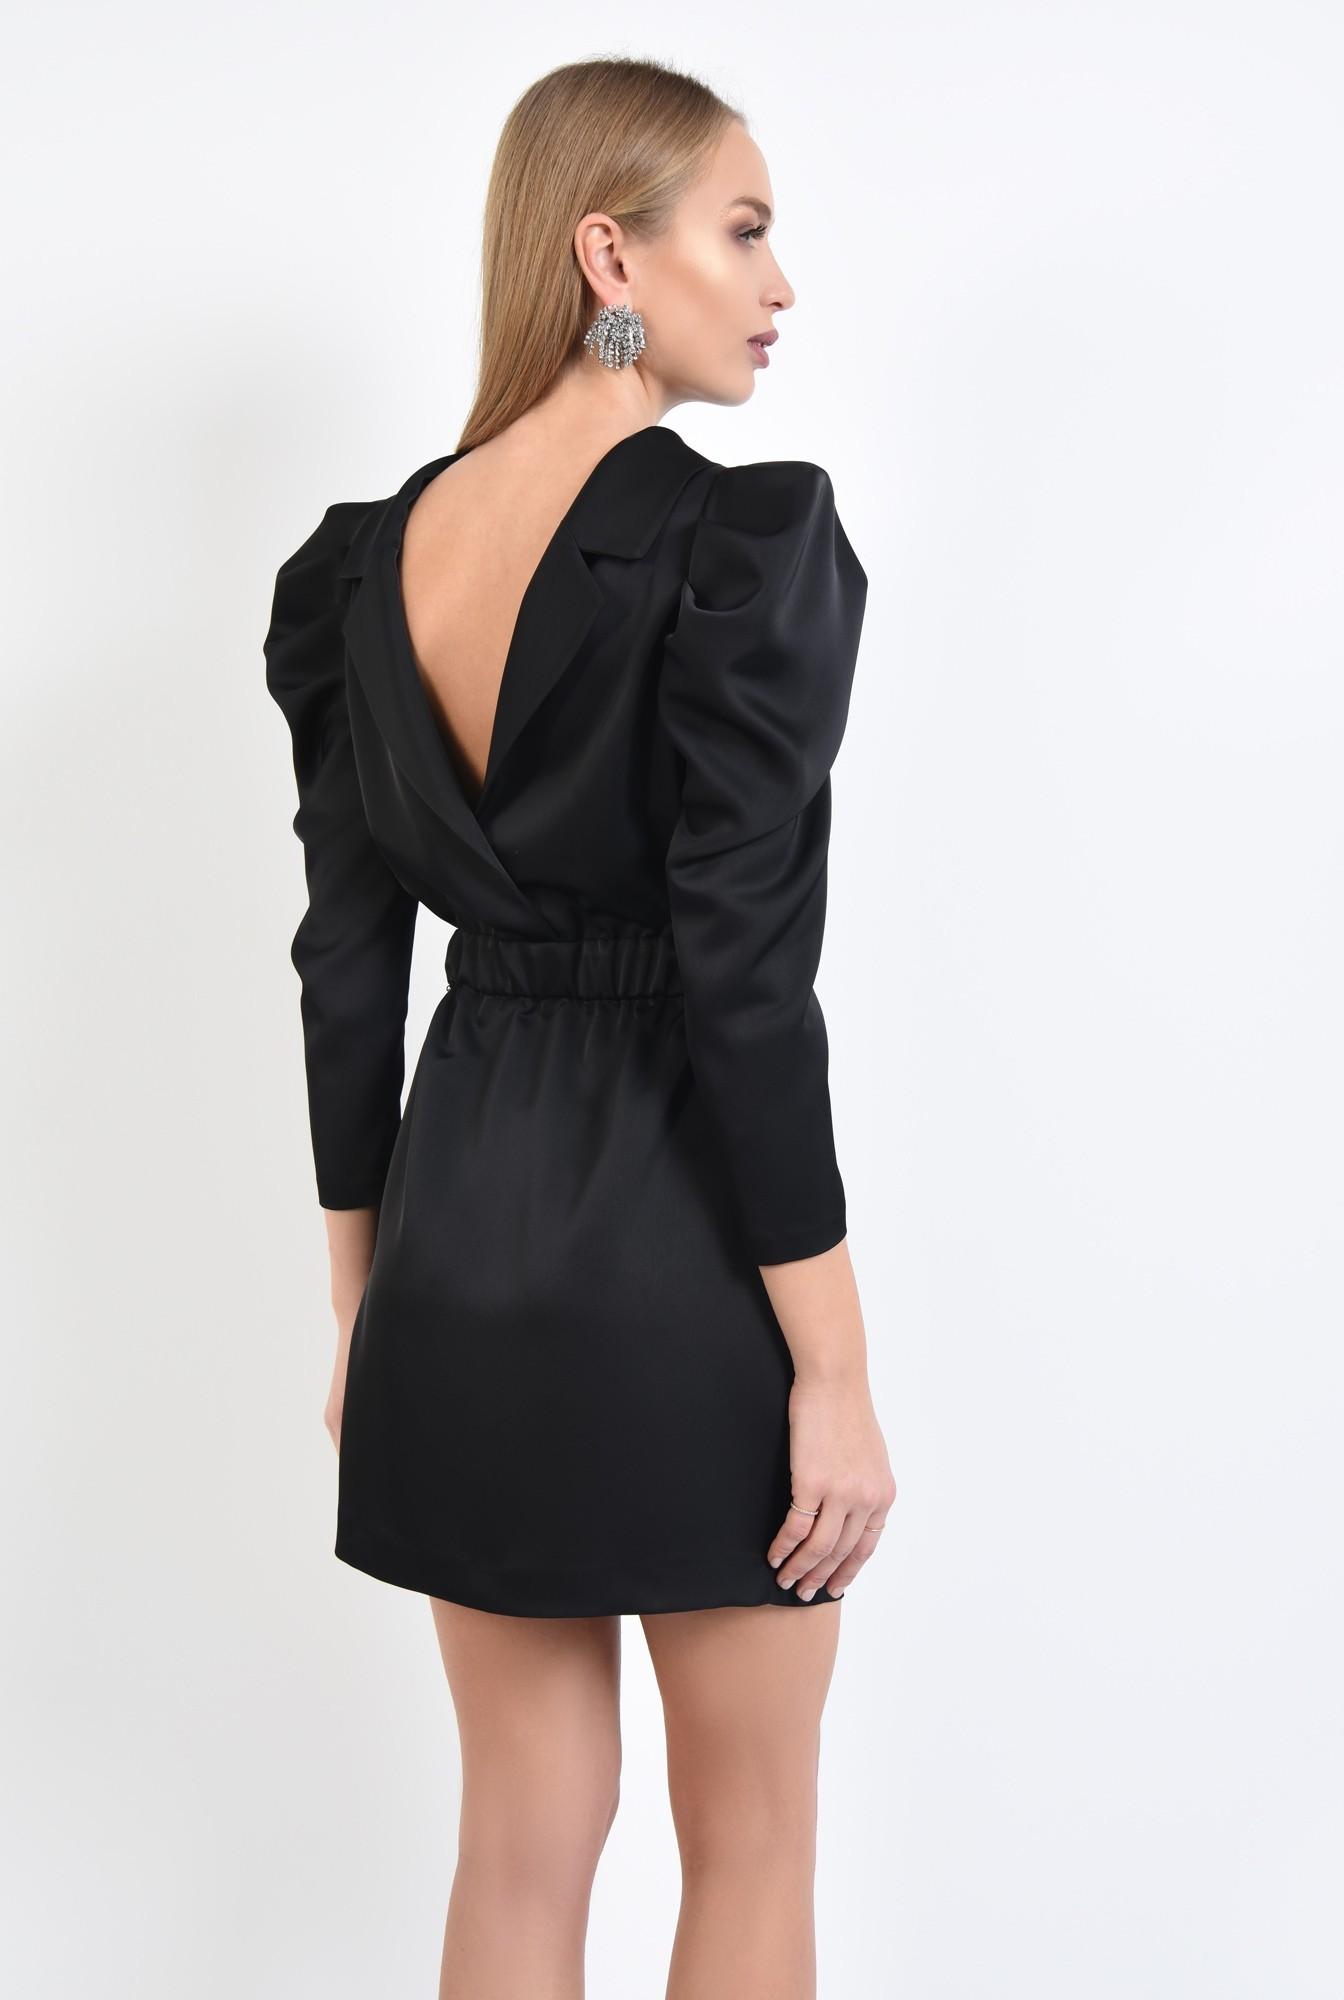 1 - 360 - rochie de ocazie, neagra, mini, maneci fantezie, tesatura satinata